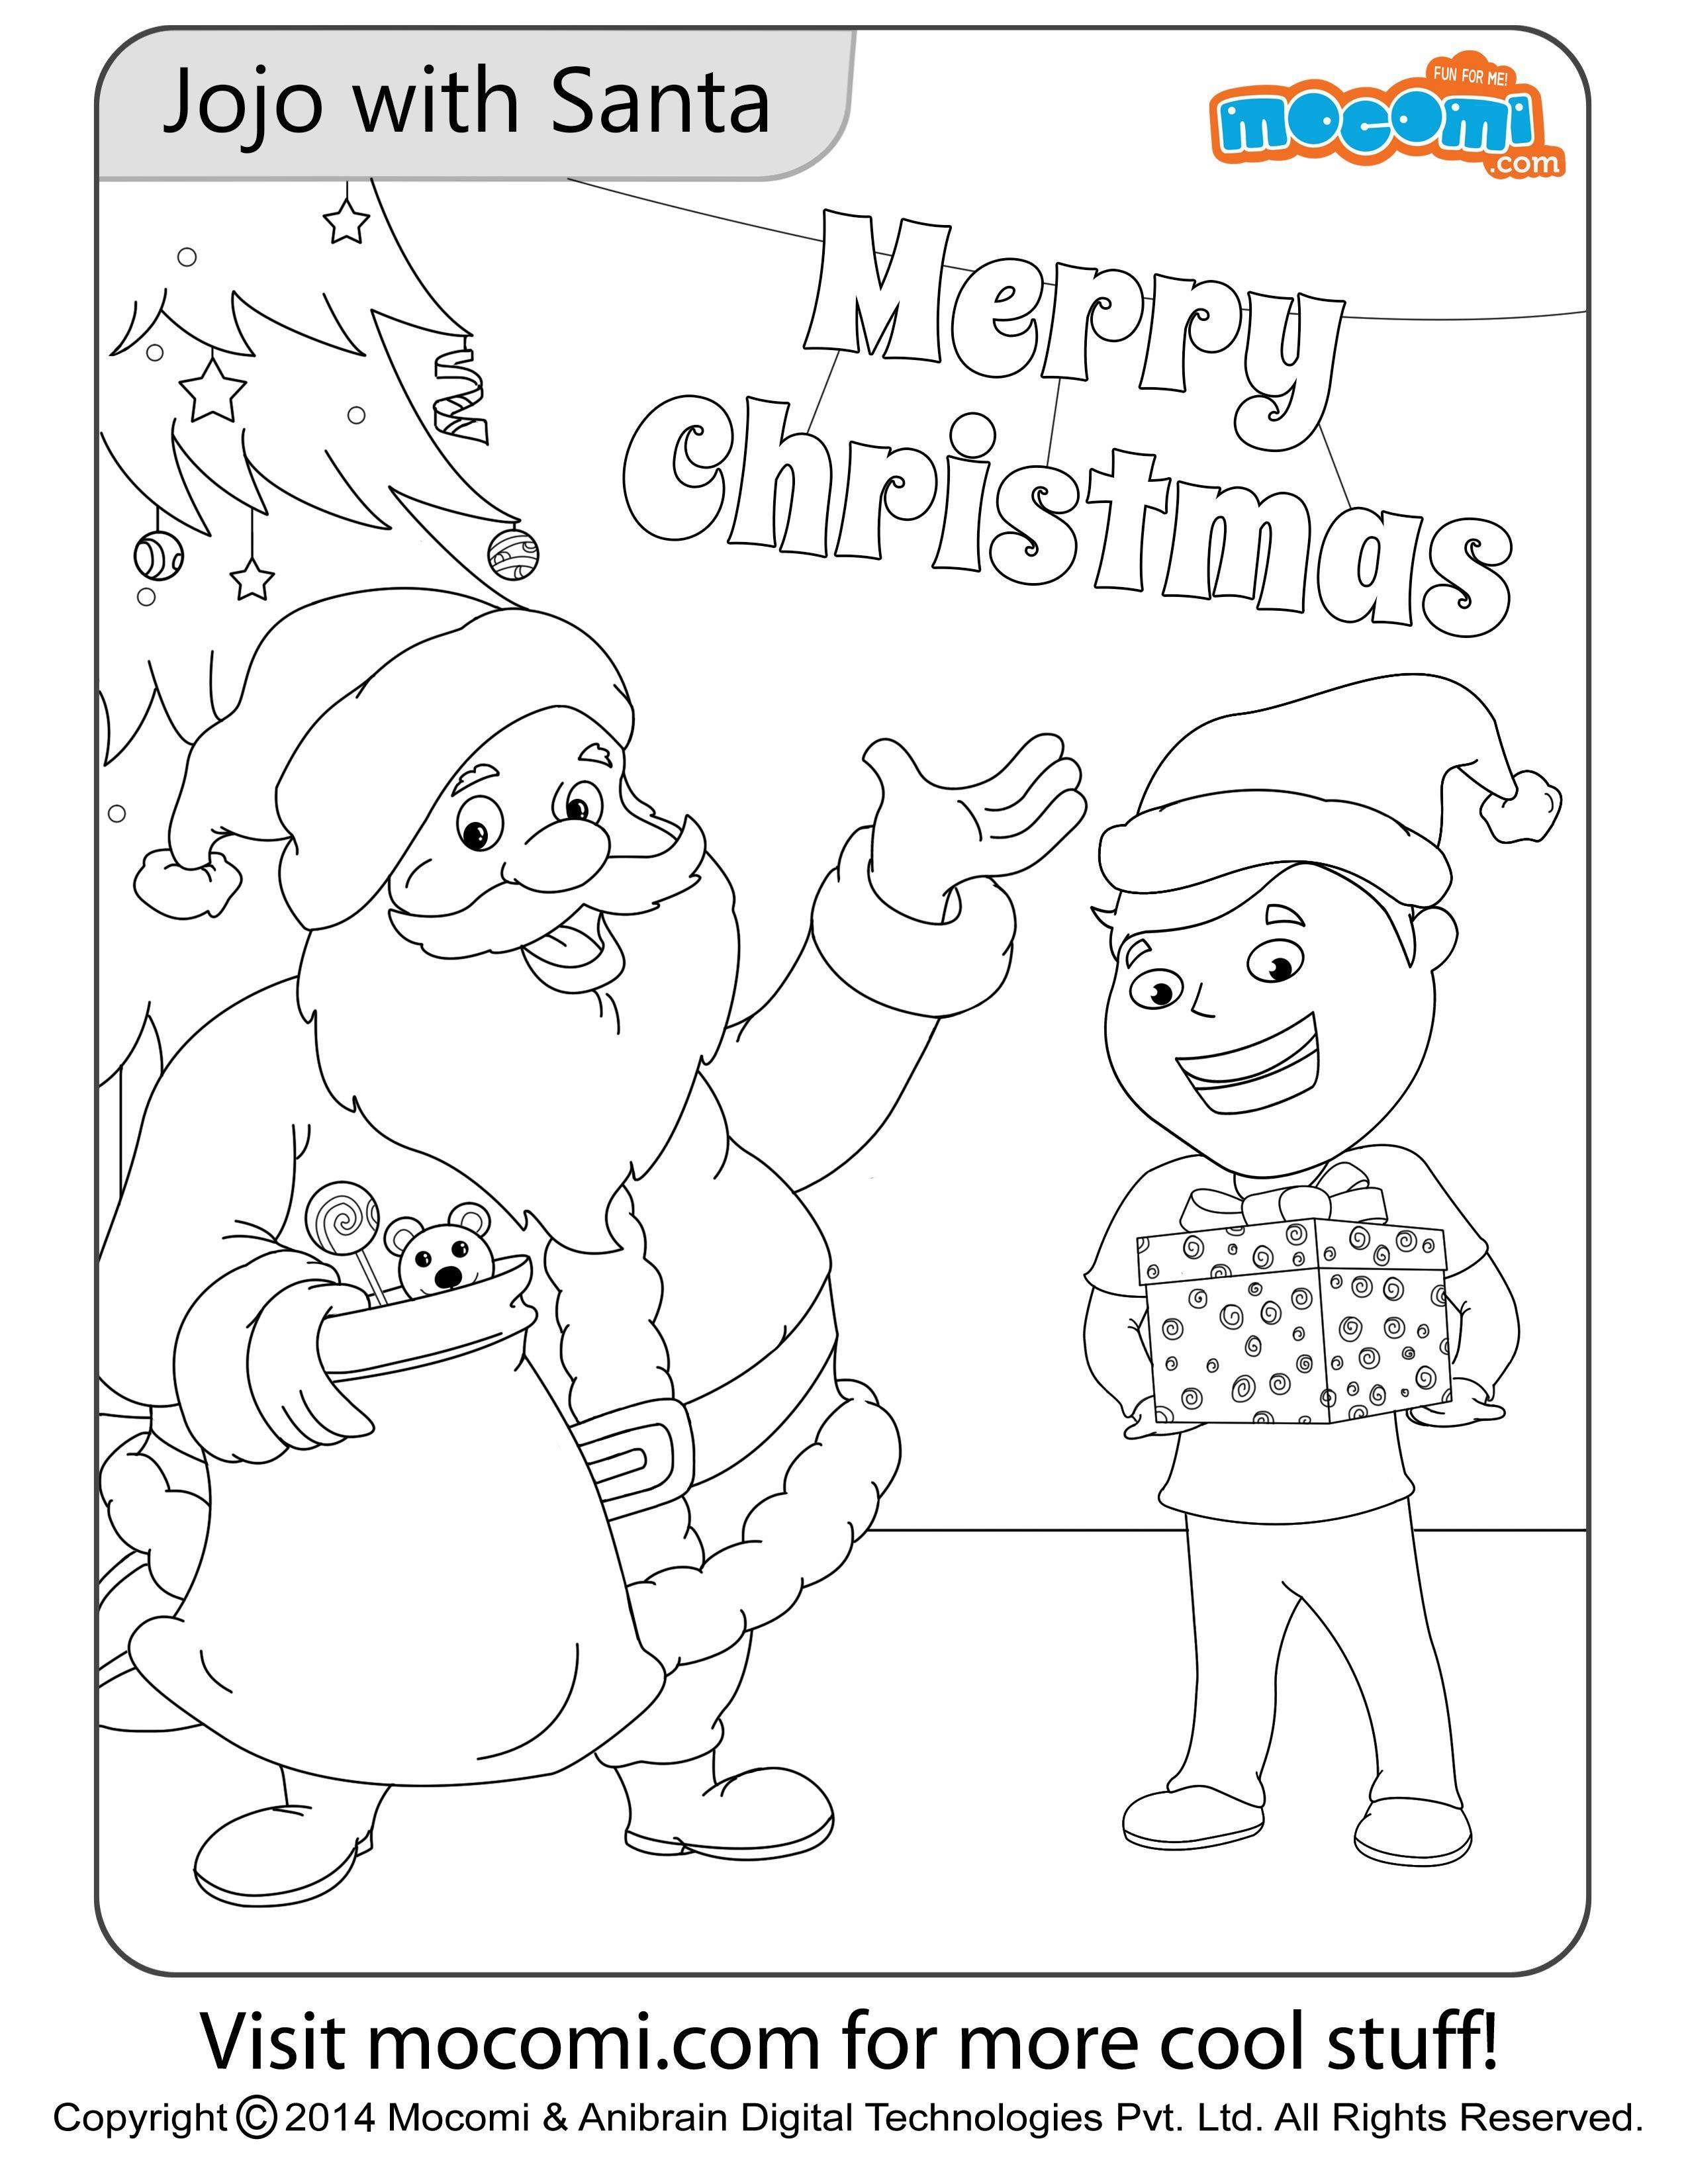 Jojo With Santa Colouring Page